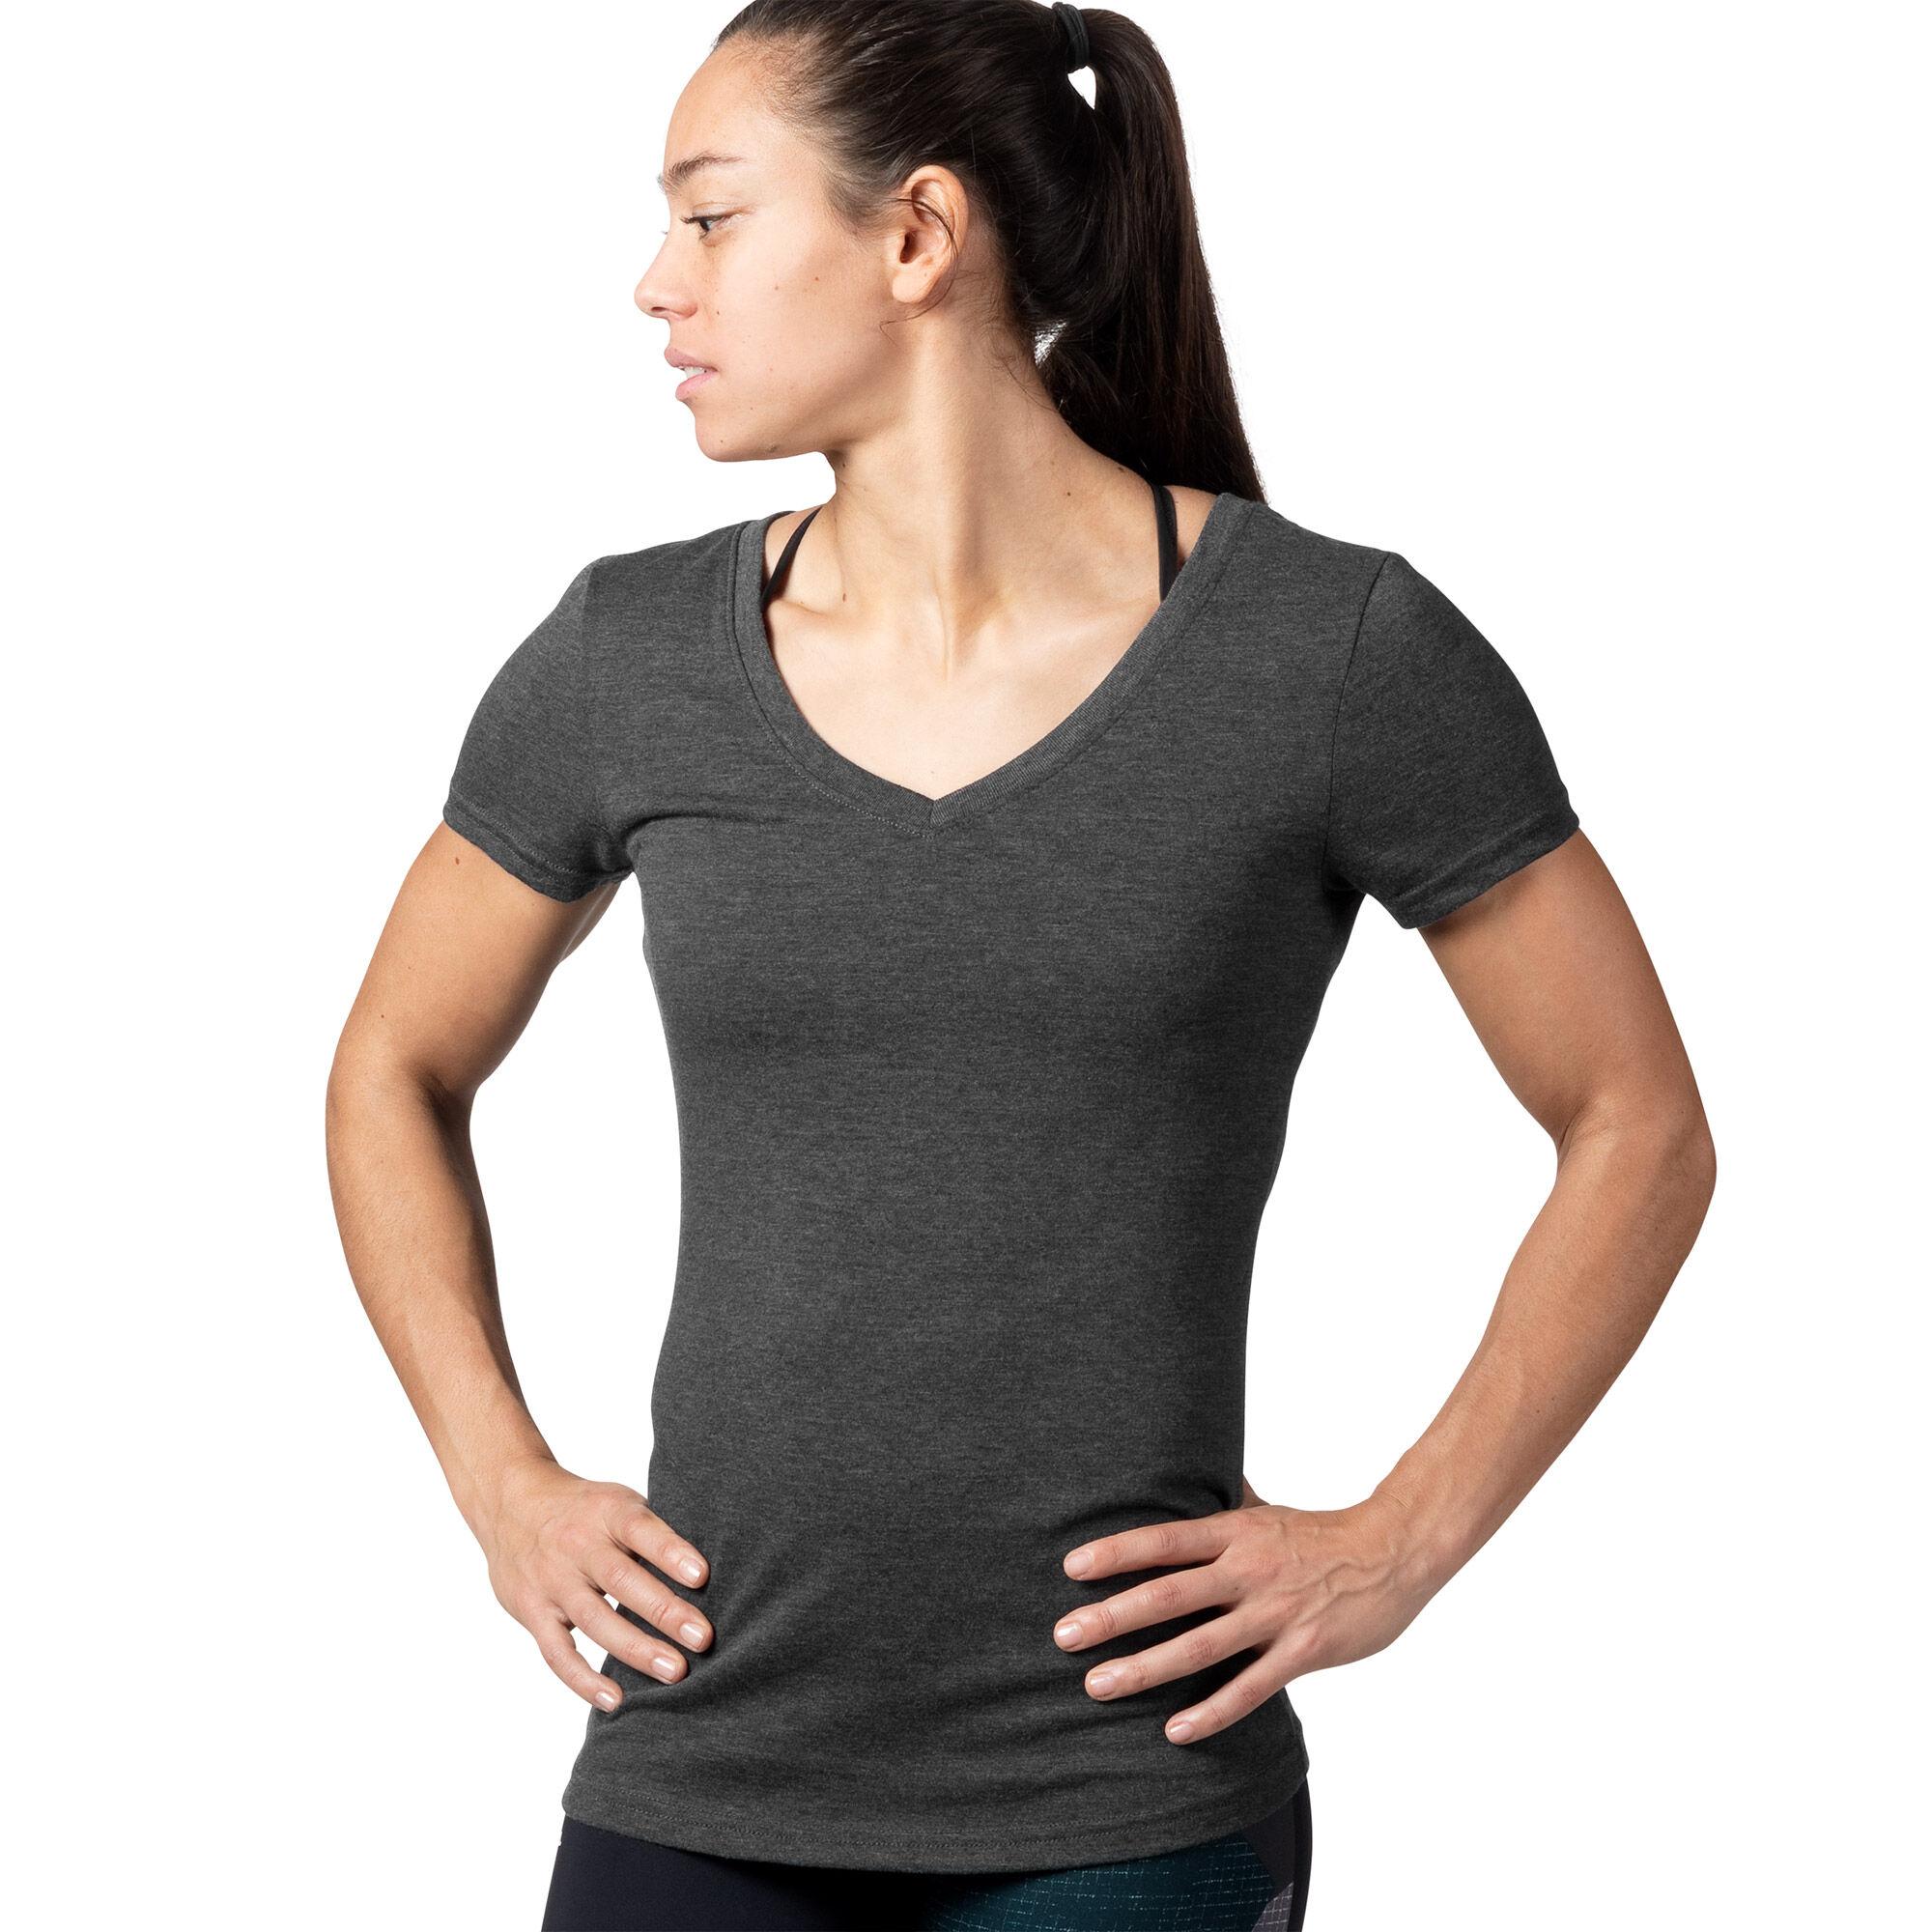 Reebok - Reebok V-Neck T-Shirt Black AJ8013